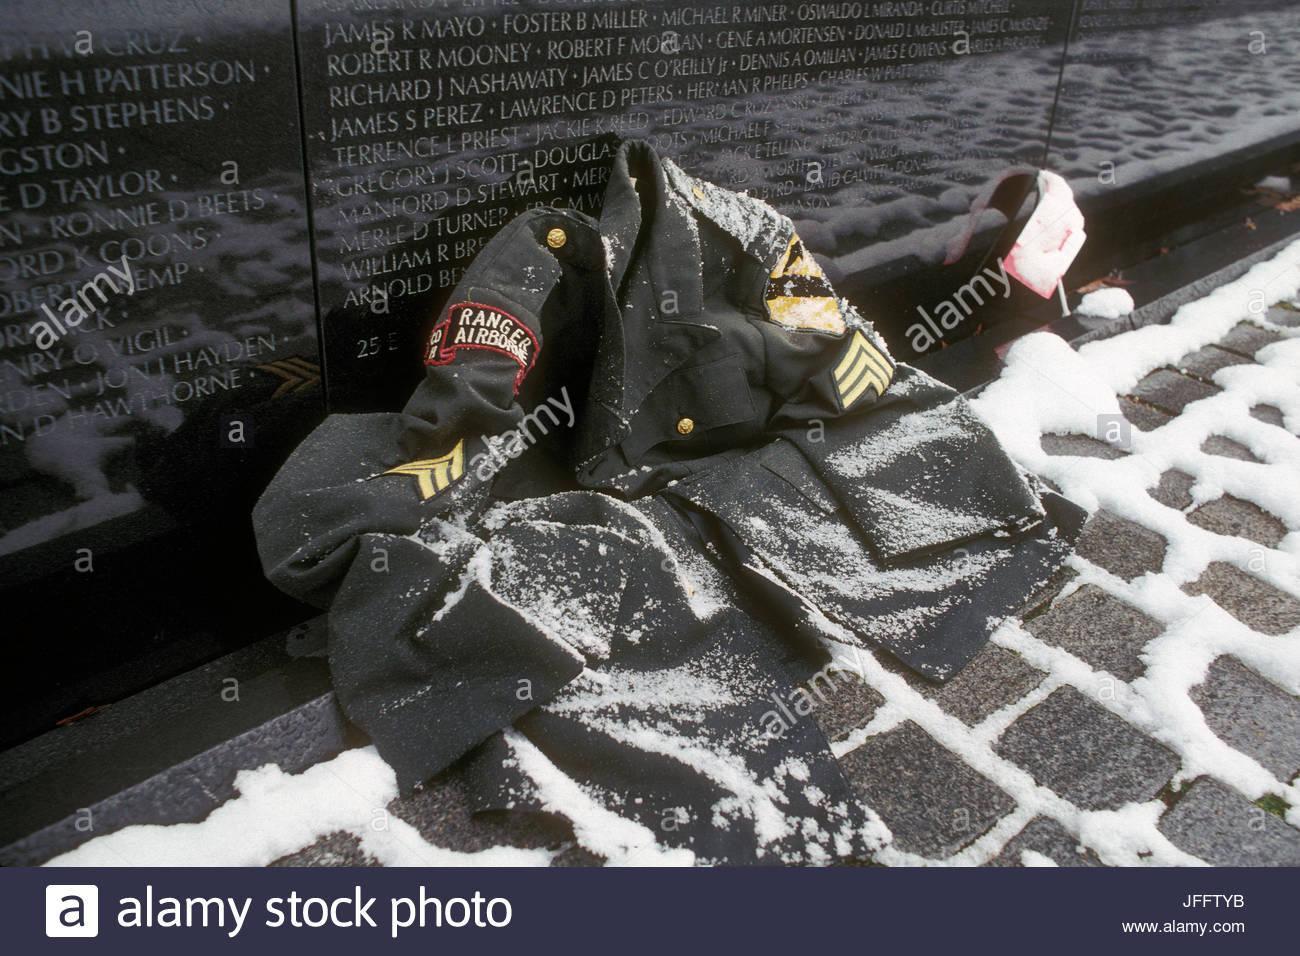 Part of a Vietnam era Army dress uniform in the snow at the Vietnam Veterans Memorial. - Stock Image